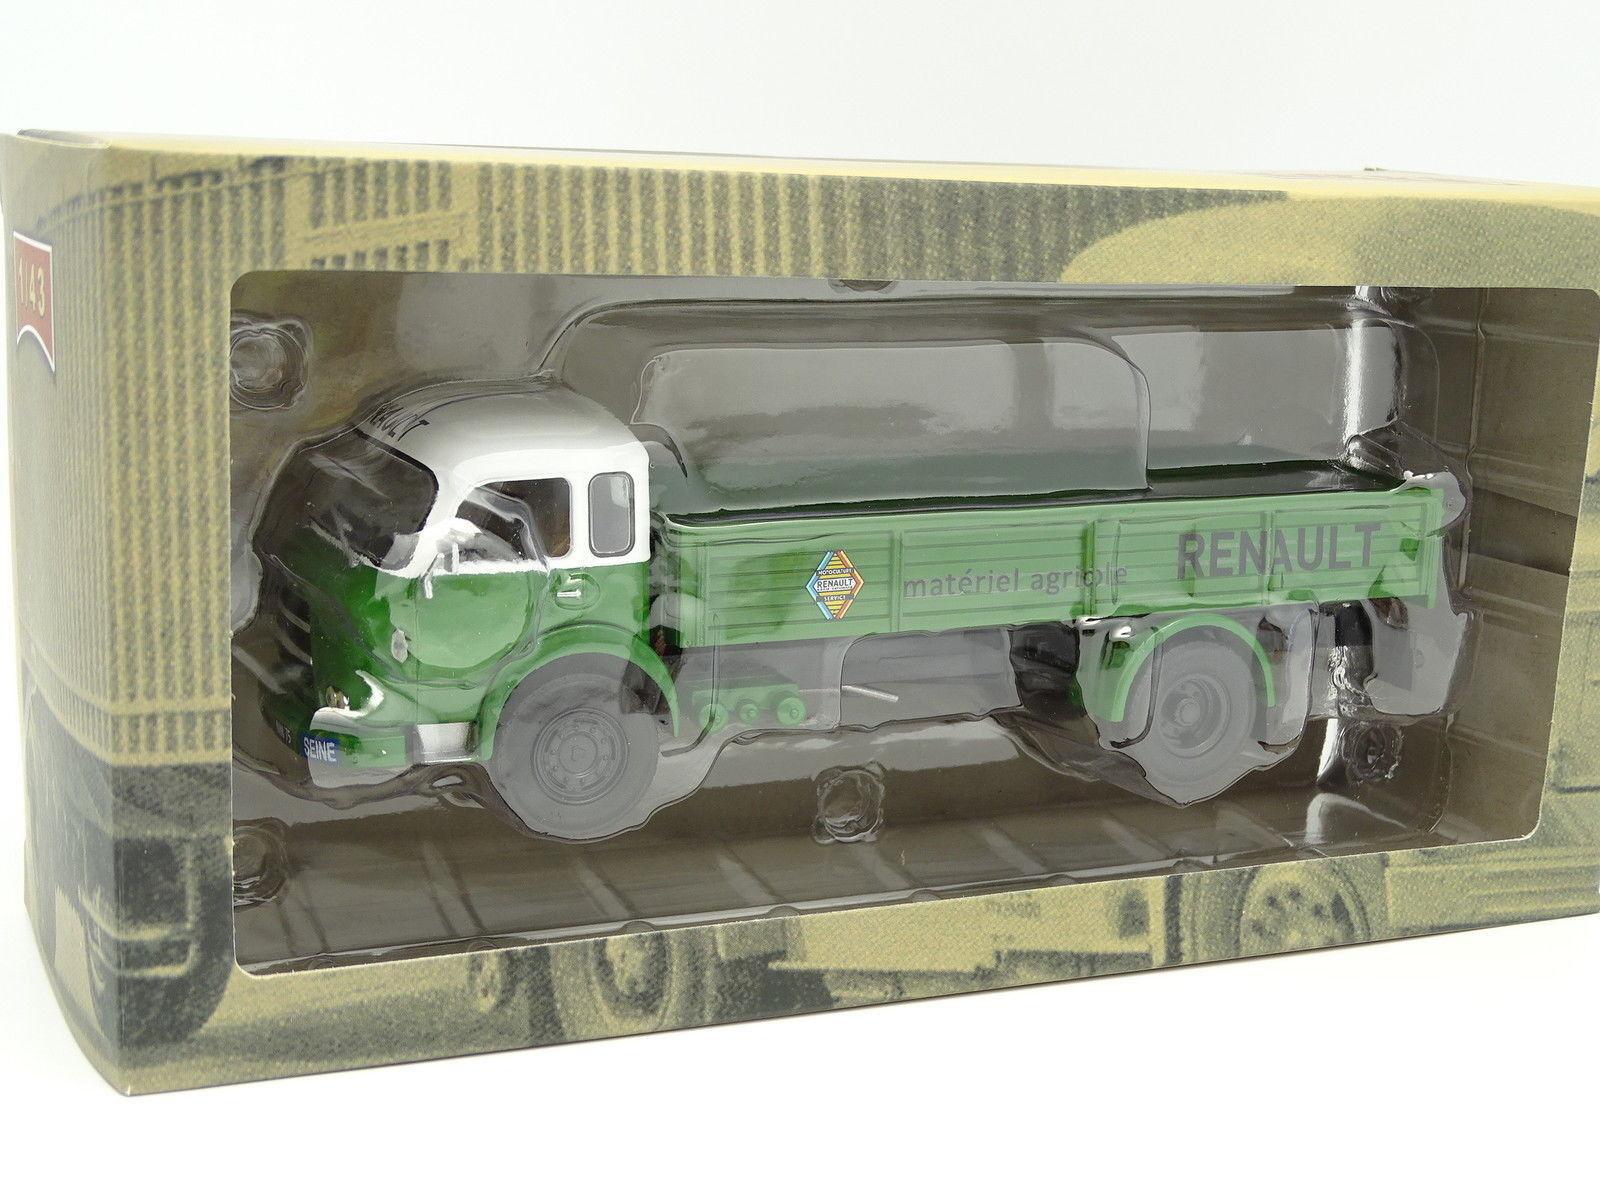 Ixo Camion antico 1 43 - Saviem JL21 Materiale Agricola Agricola Agricola Renault 7d0714